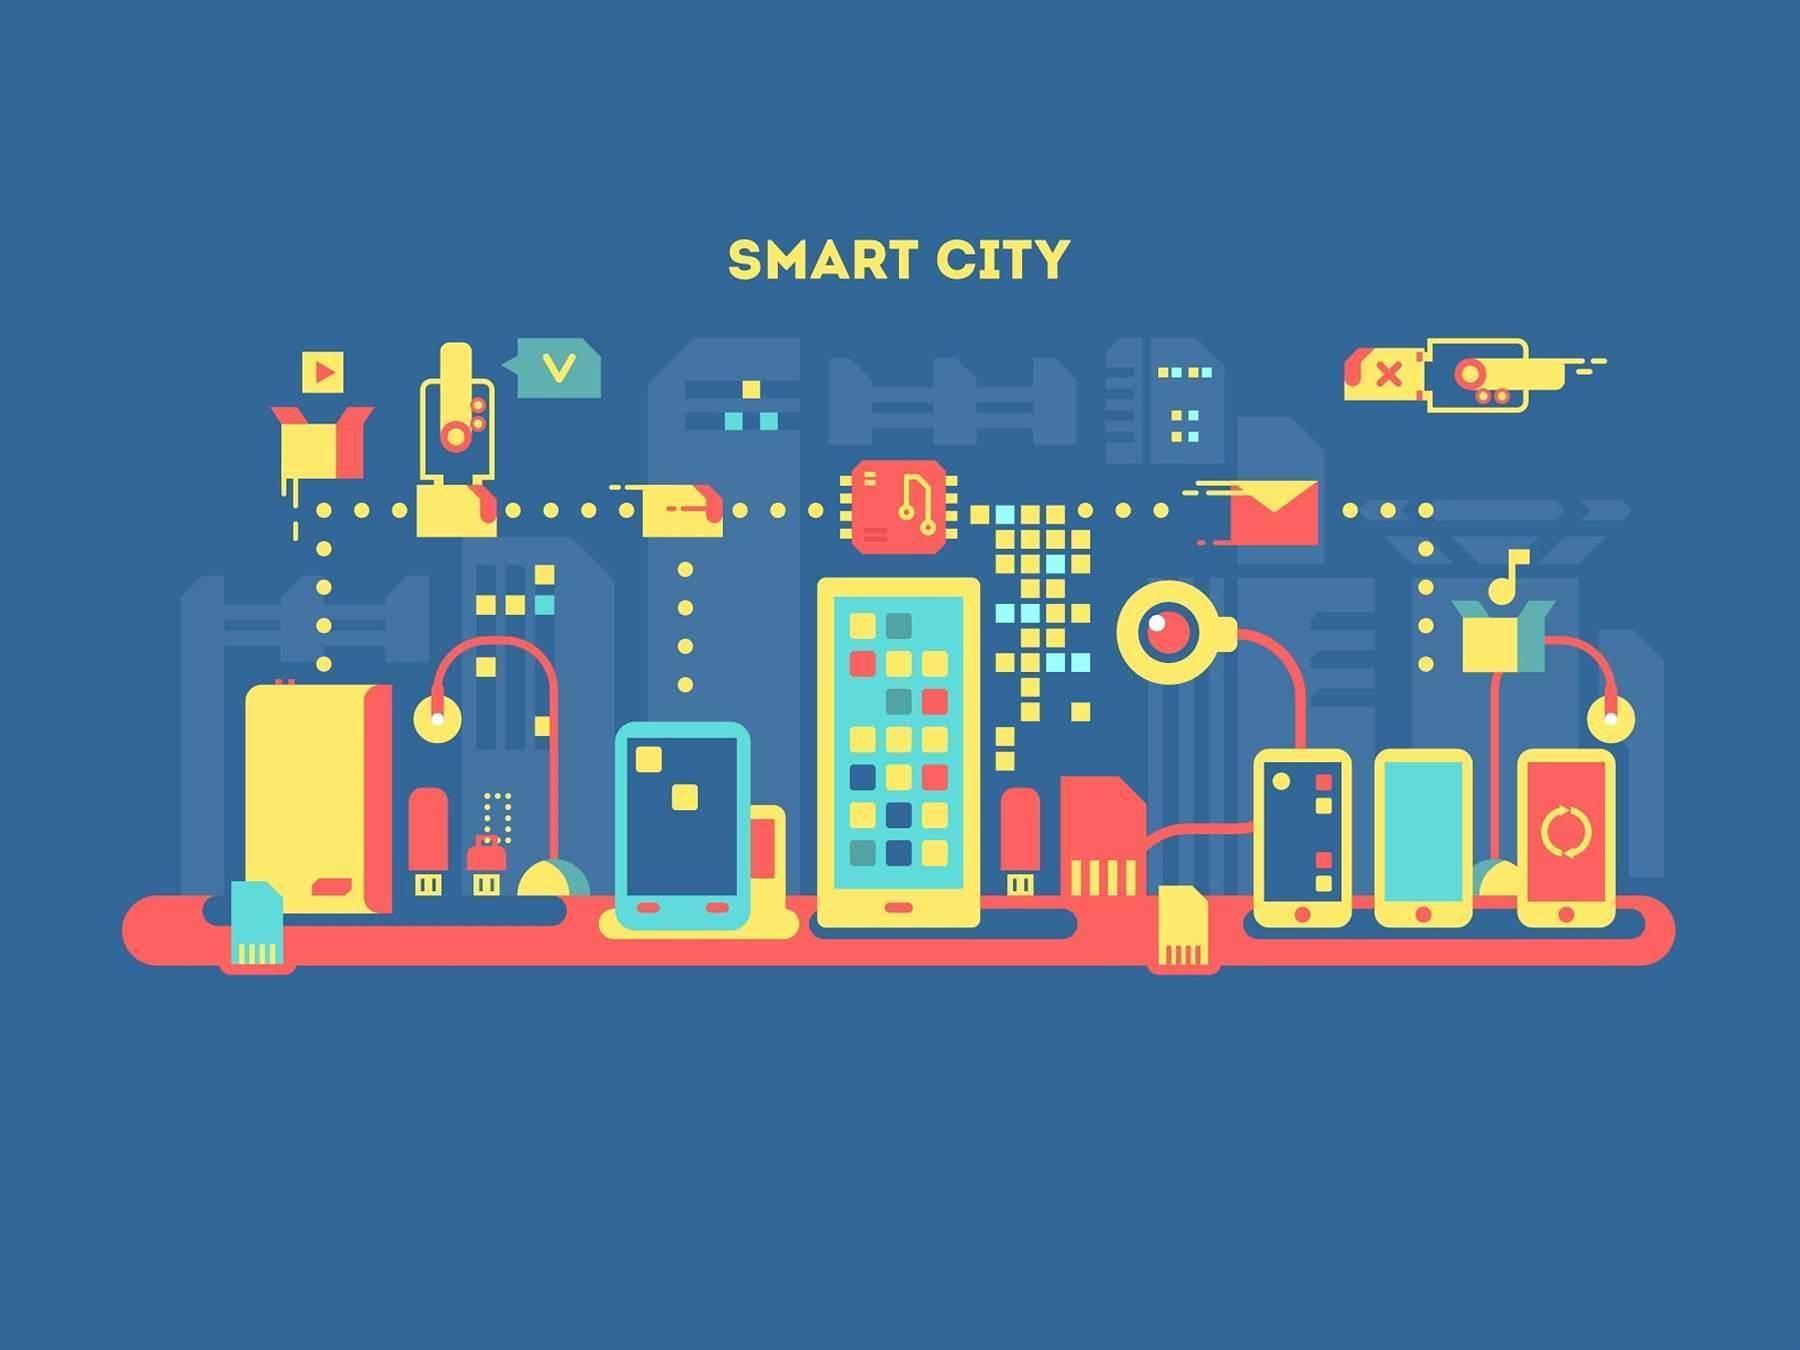 Five strategies to unlock smart city potential